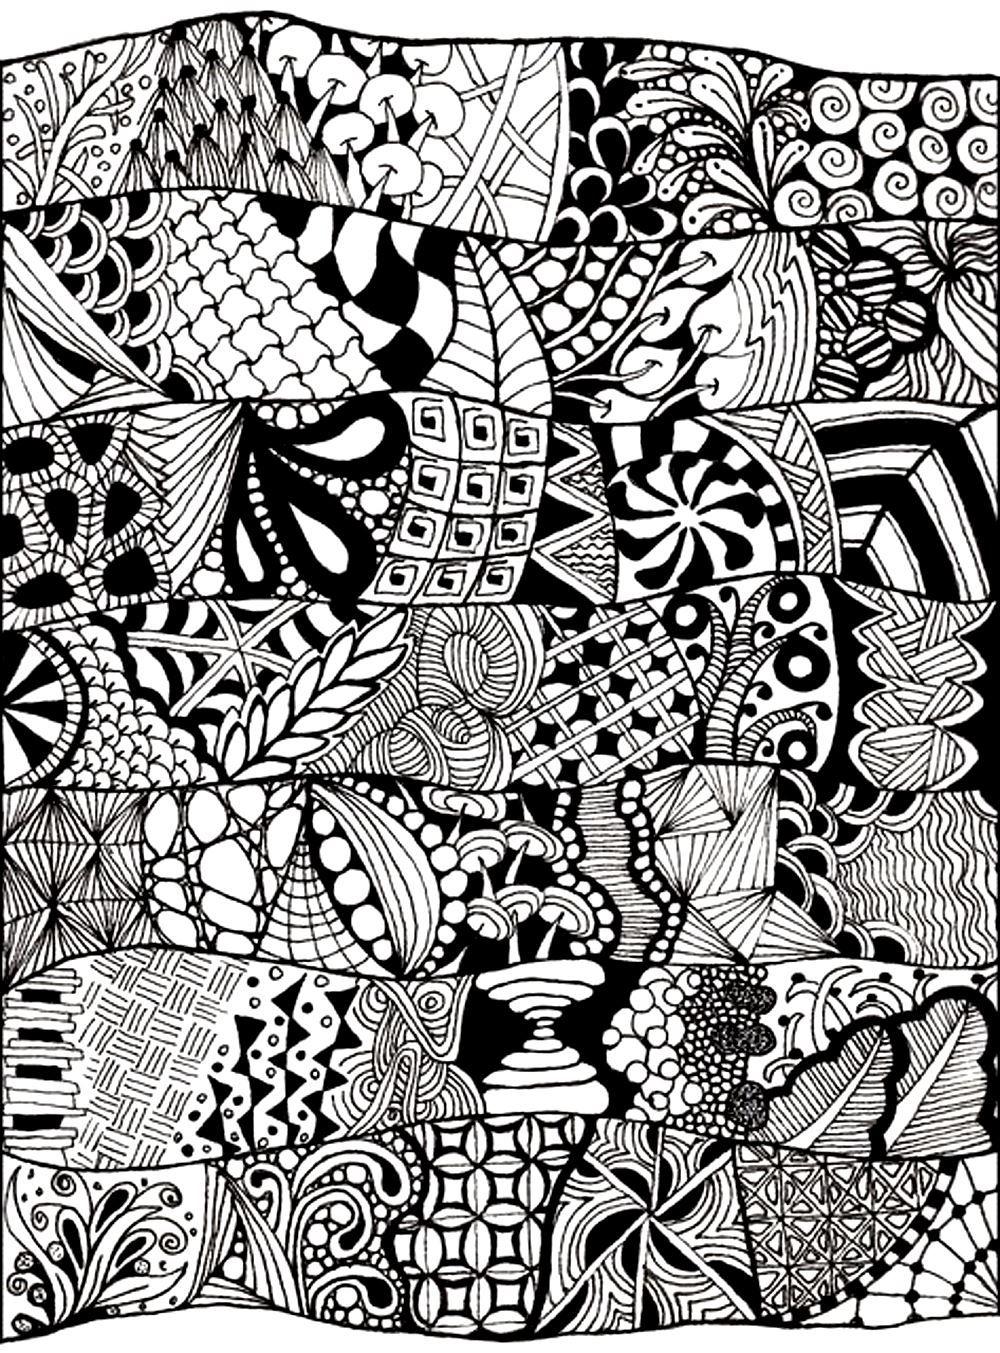 Zen Anti Stress Abstract To Print - Anti Stress Adult dedans Image Zen A Imprimer